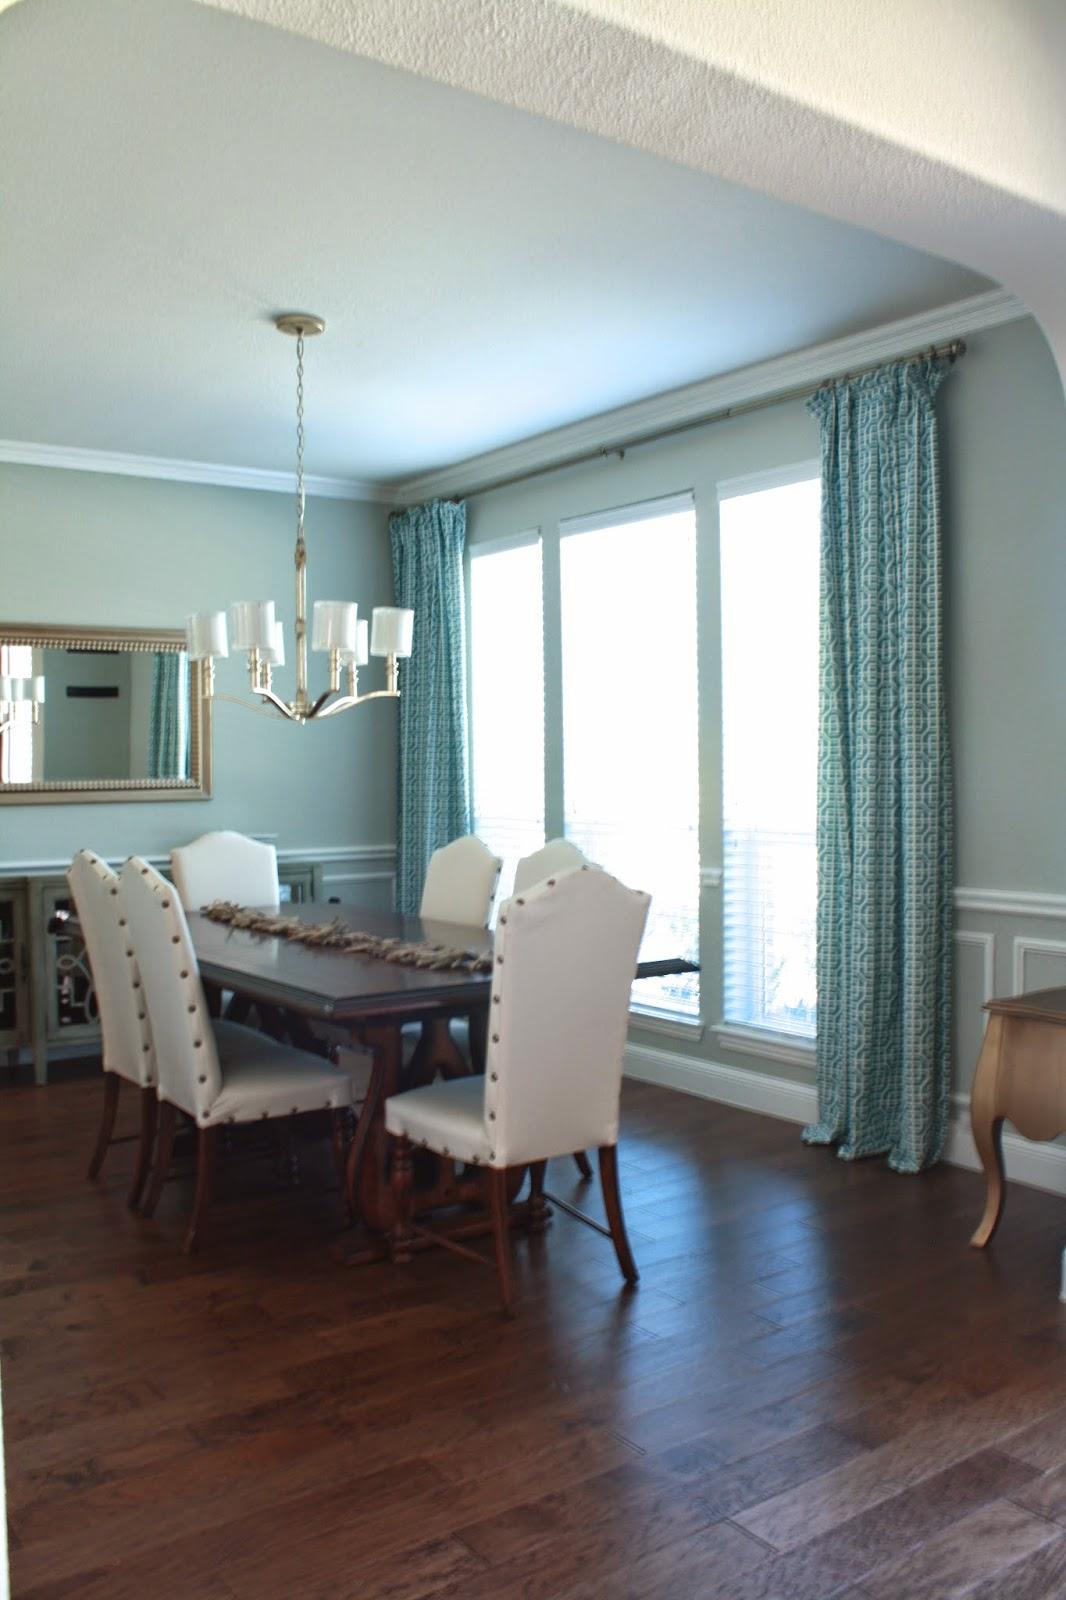 Urban Farmhouse: Tablecloth Curtains